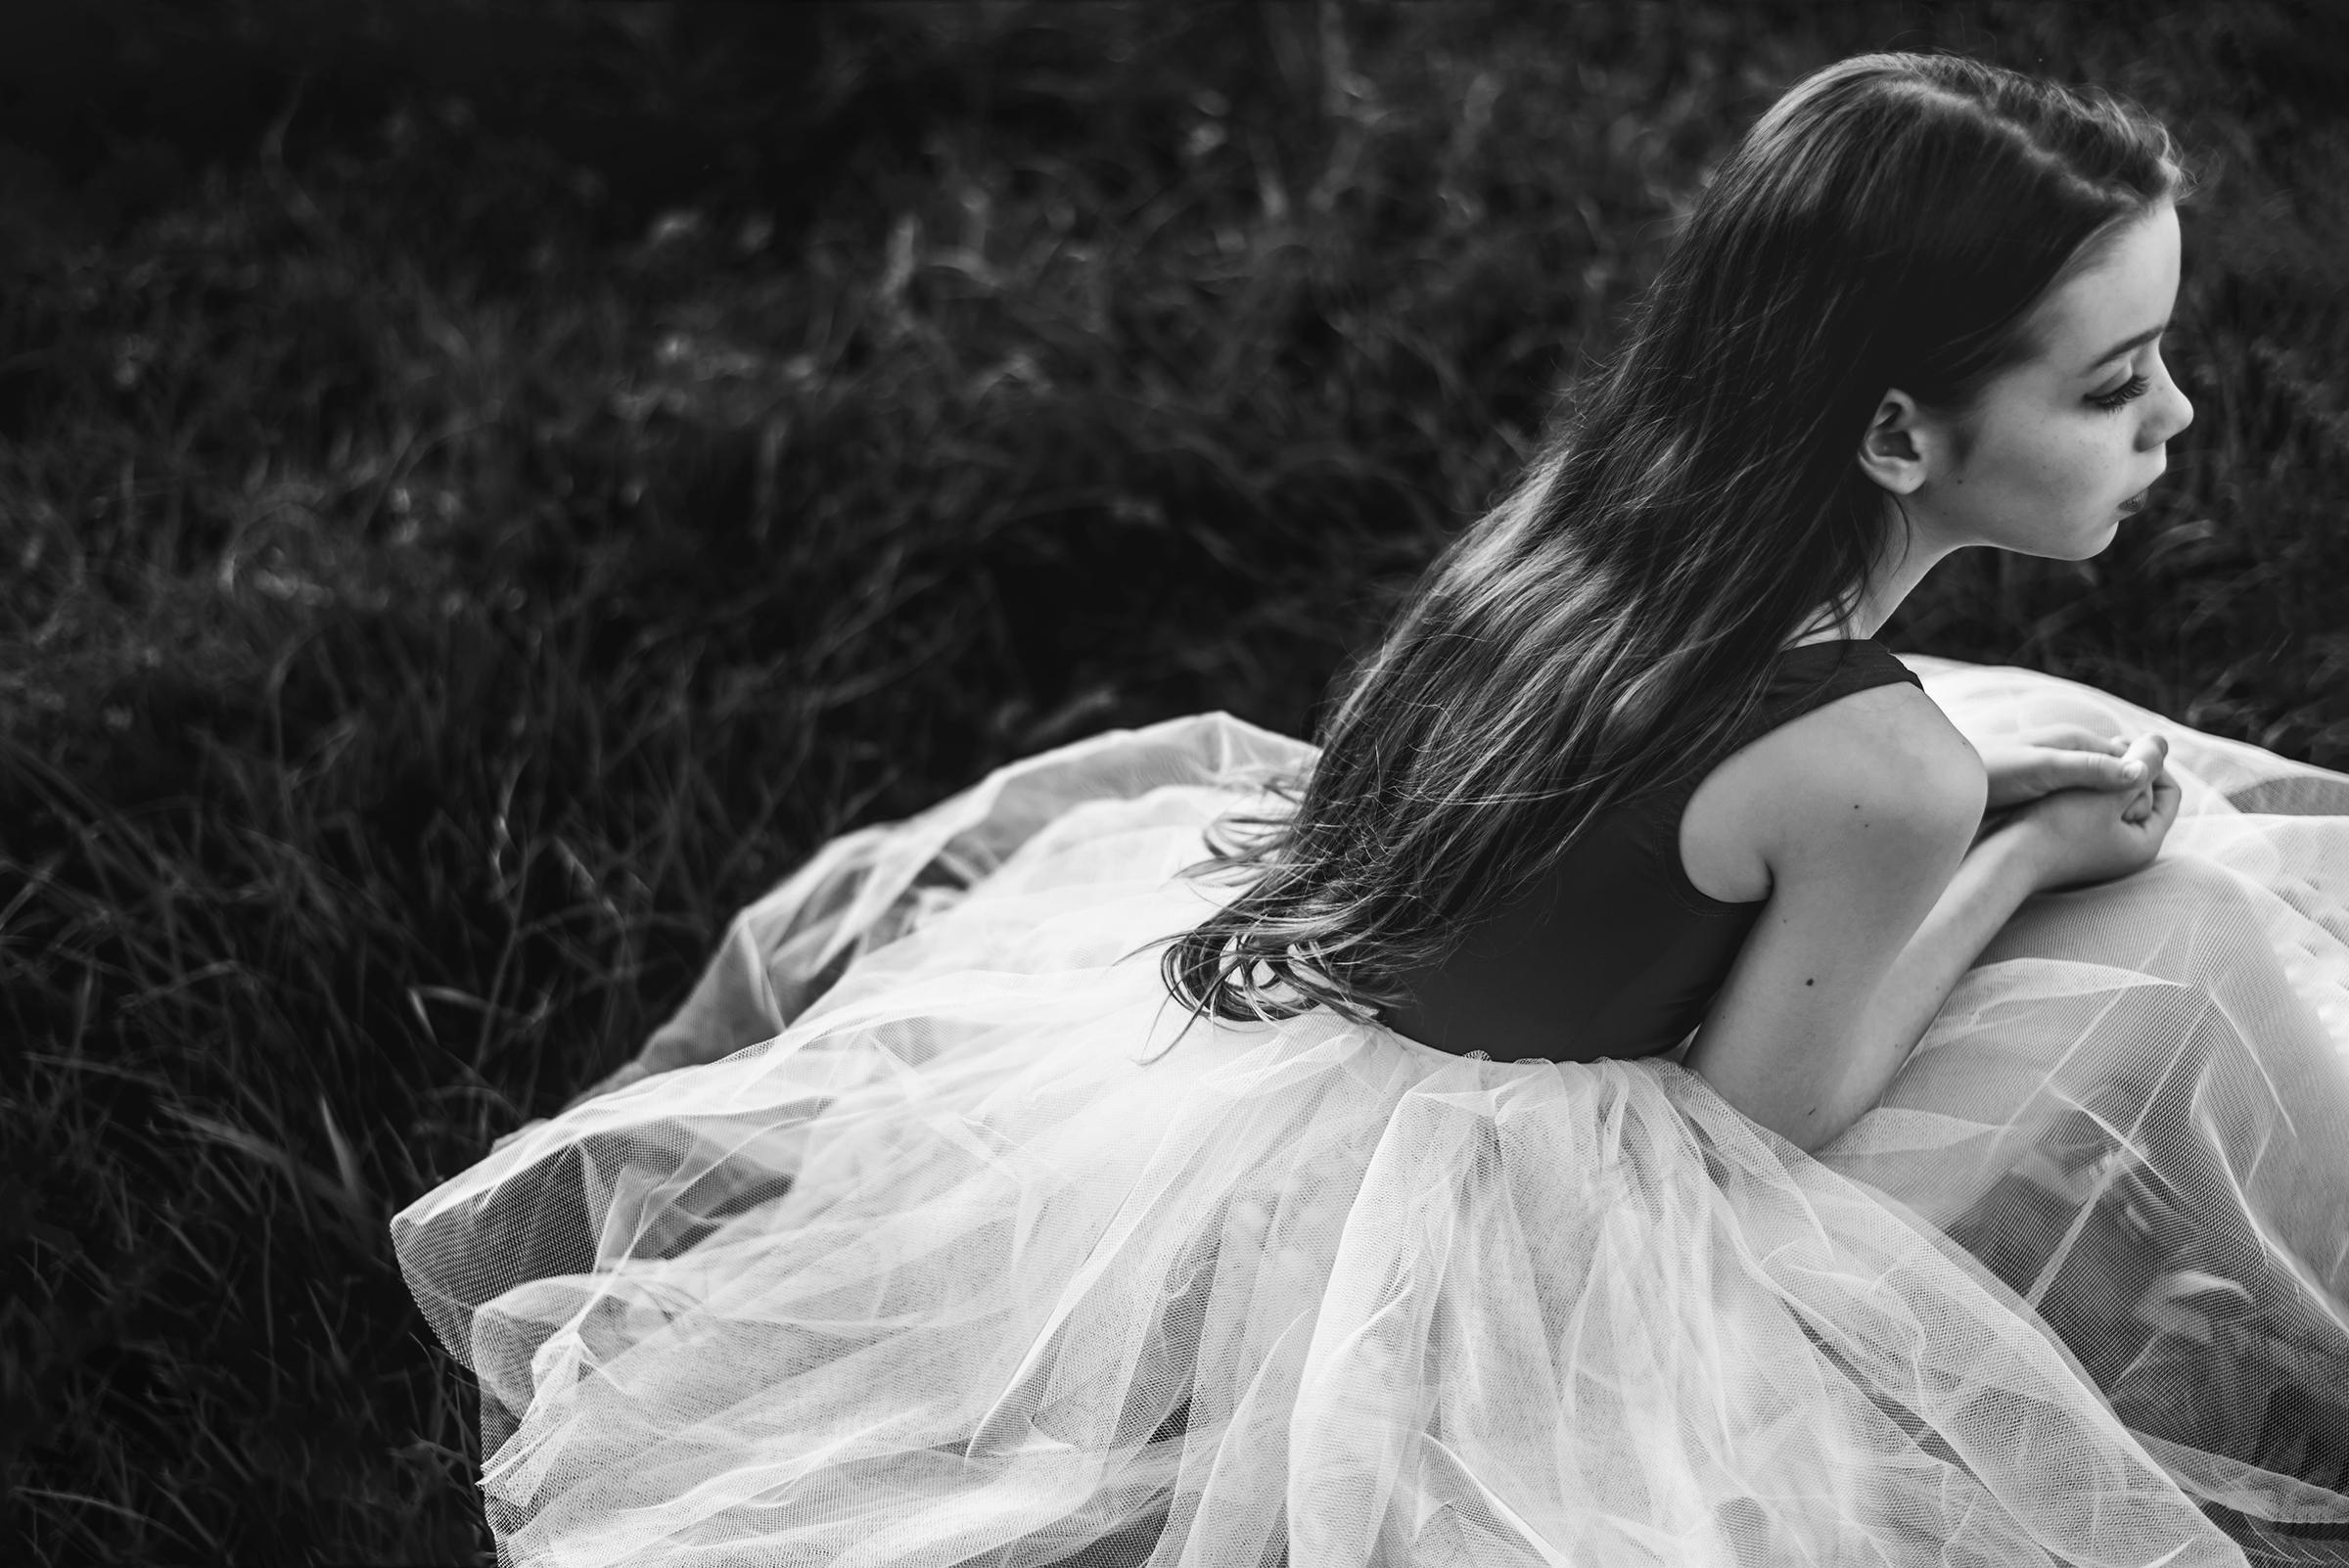 Monochrome portrait of North Brisbane girl in tutu